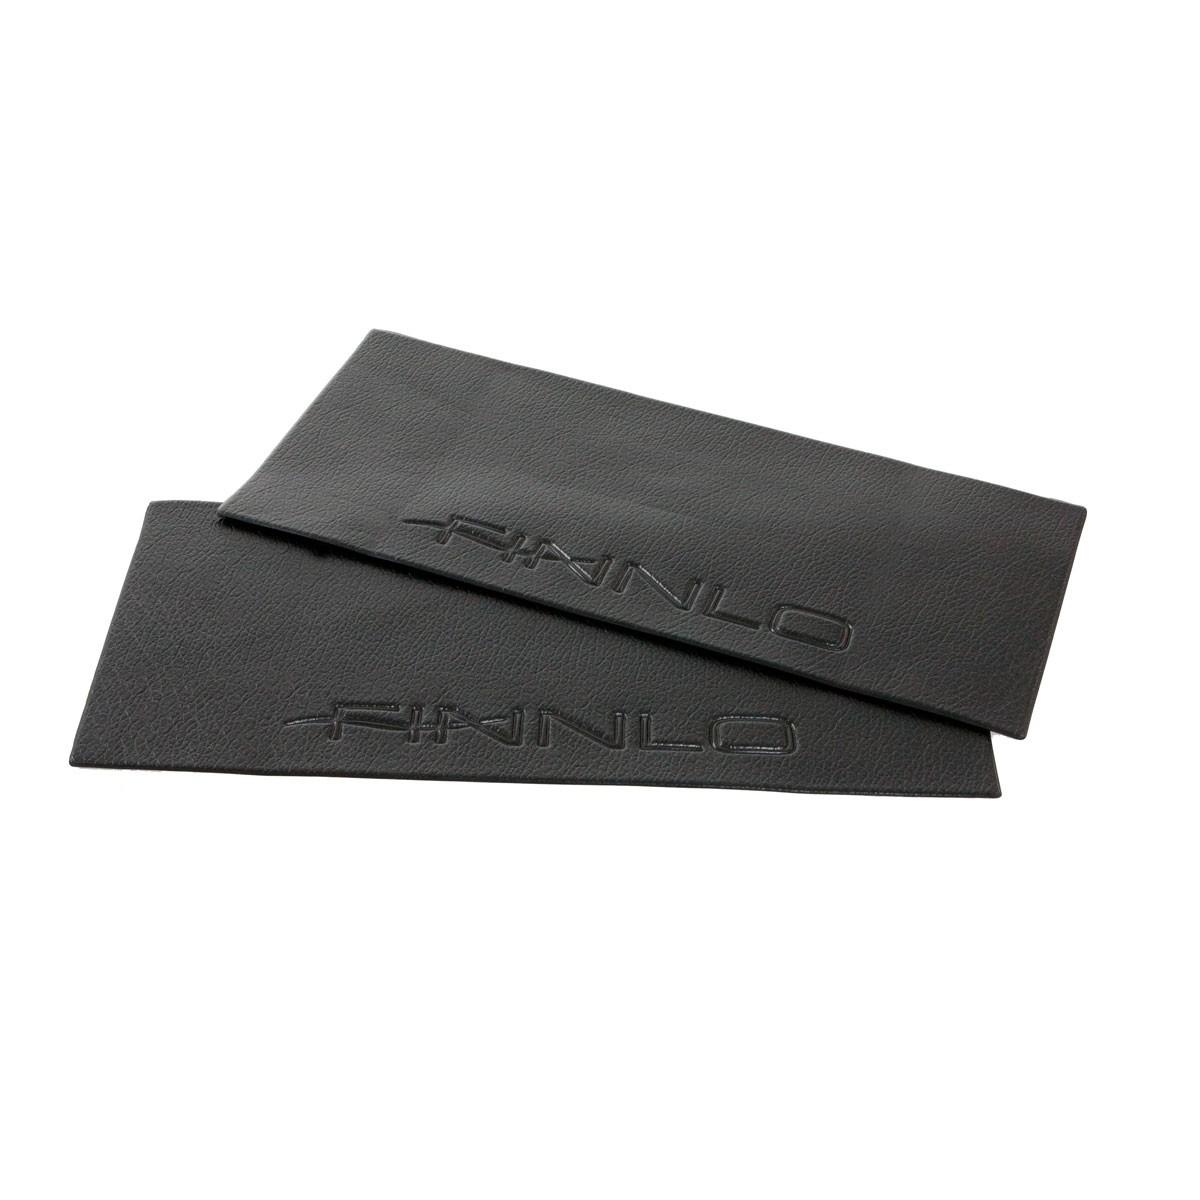 https://www.rubberflooringinc.com/Assets/Product/Images/912x600/1050.jpg